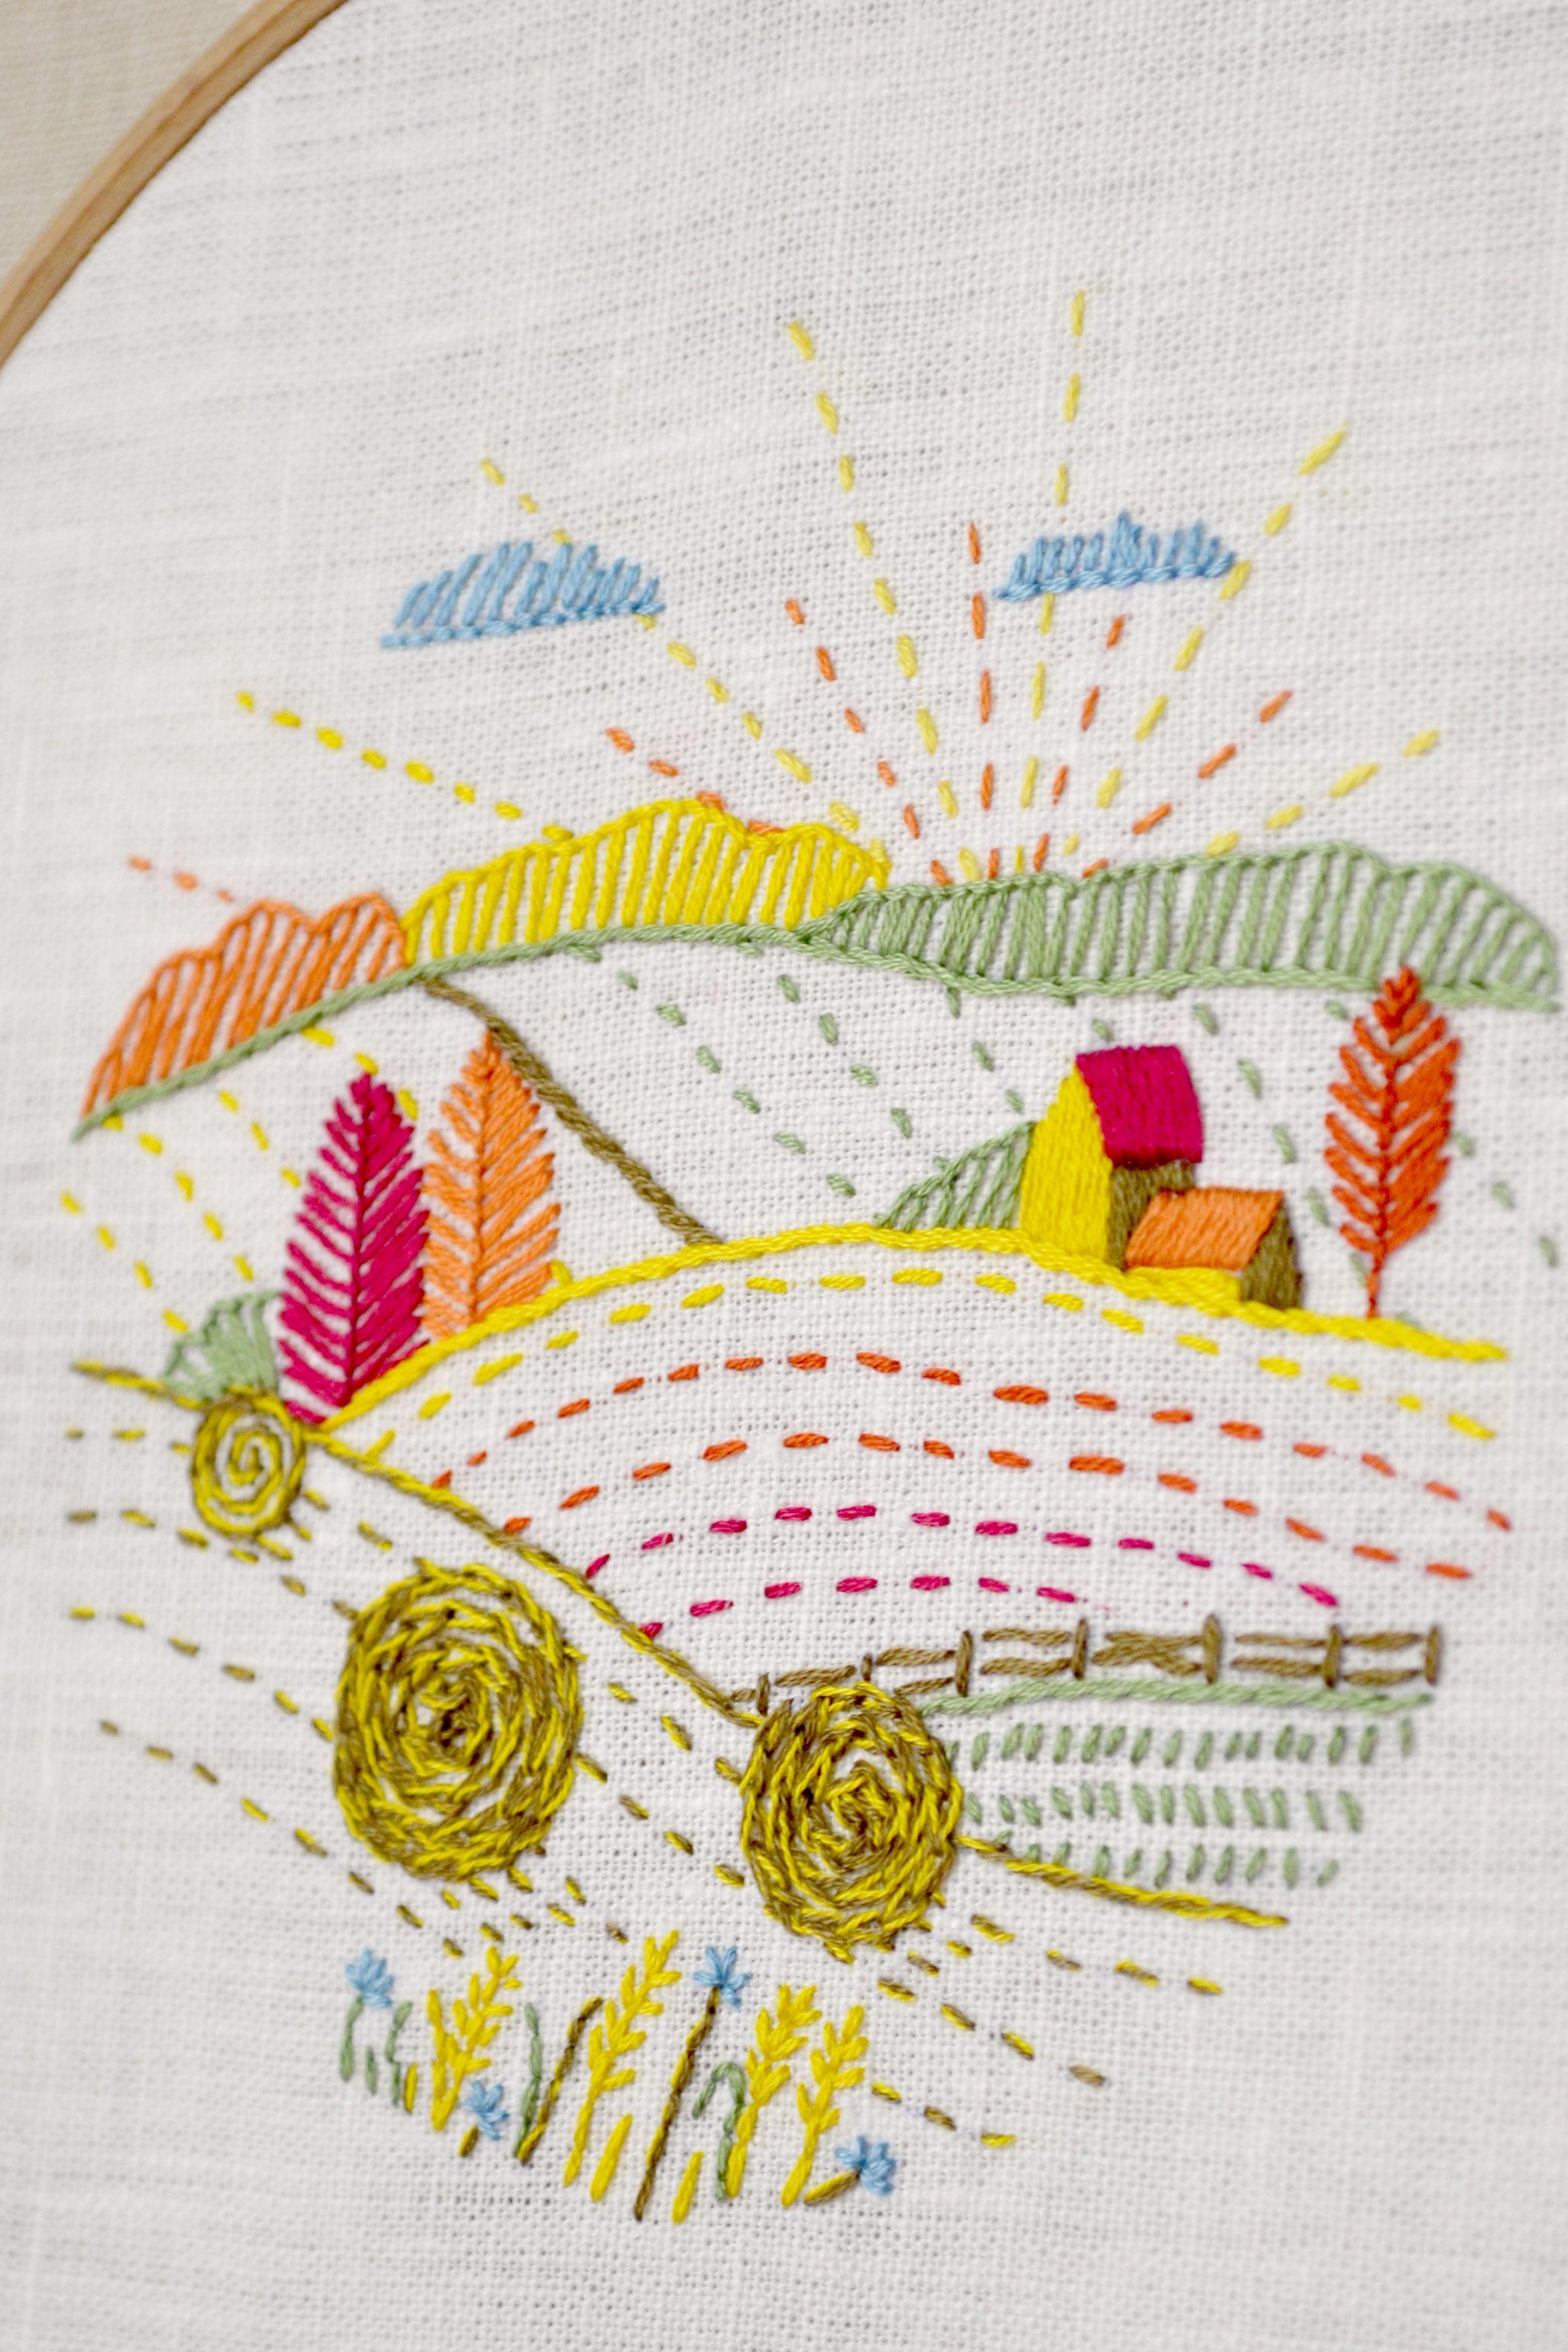 Hand embroidery designs • PDF • Autumn landscape • NaiveNeedle ...